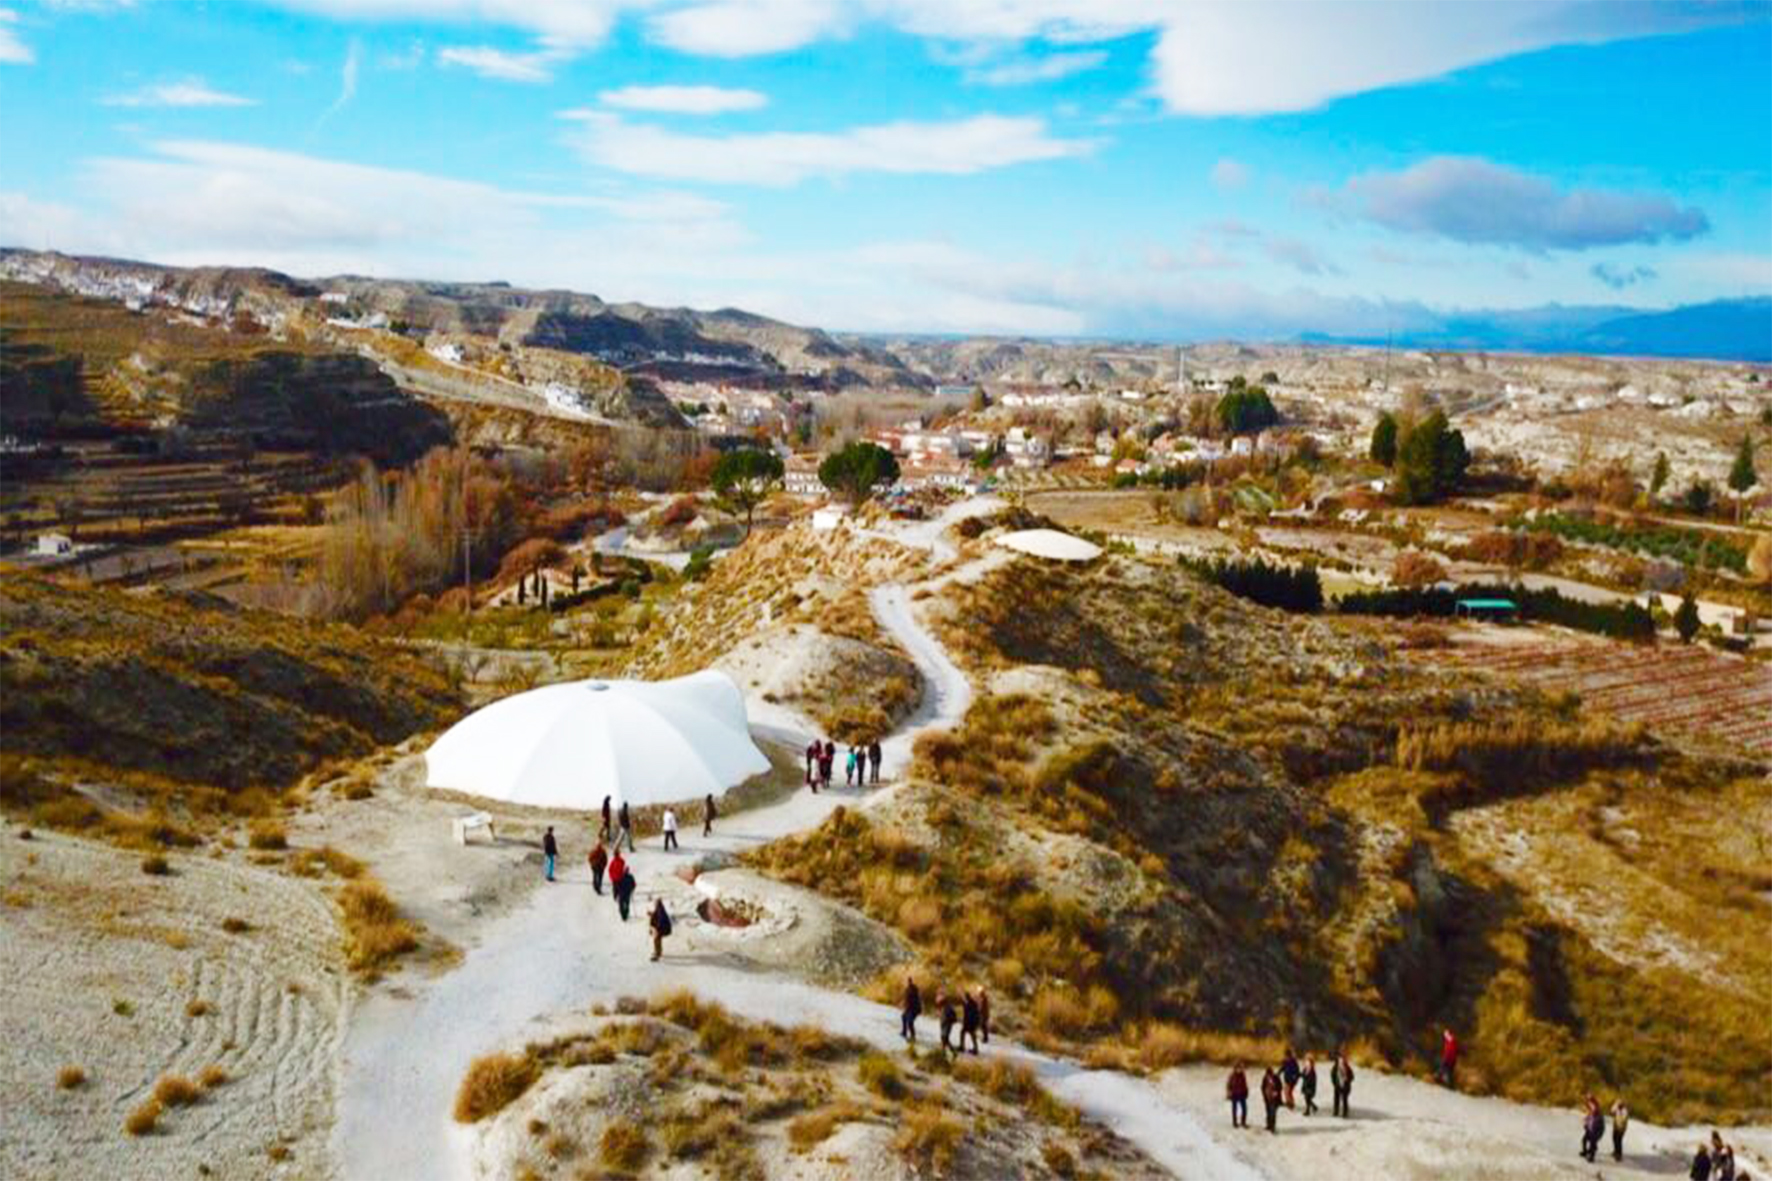 Yacimiento Arqueológico de la Necrópolis de Tútugi de Galera. Foto: venagalera.com